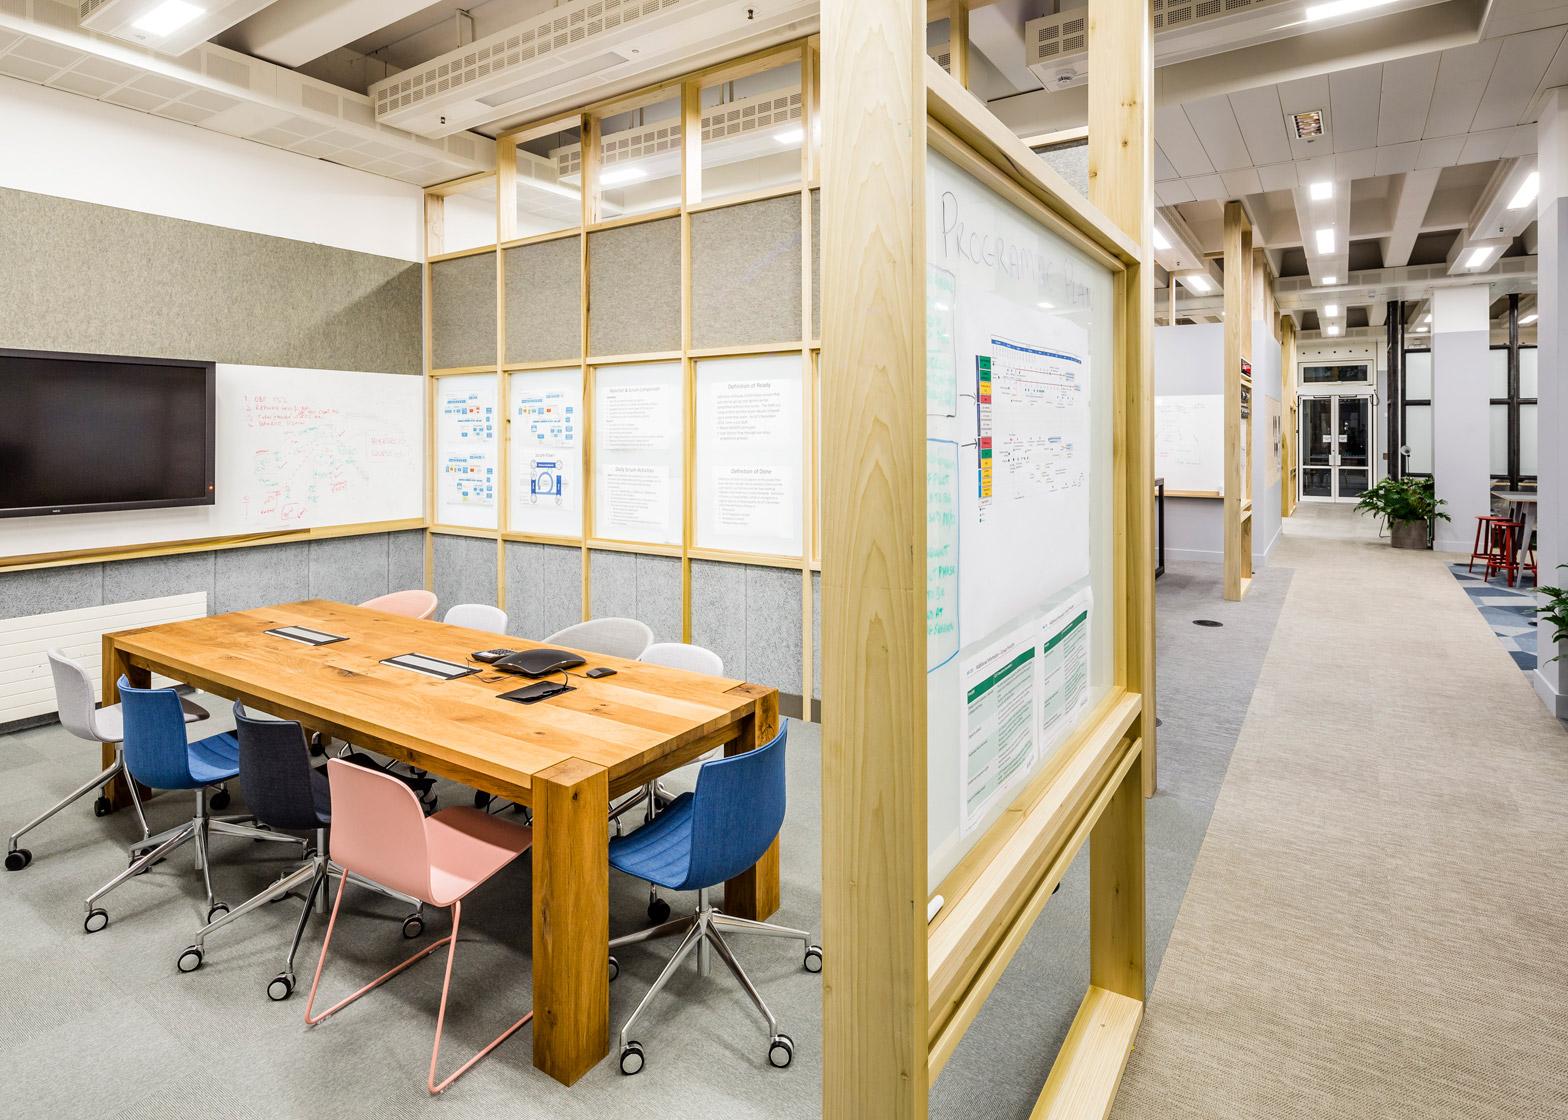 barclaycard-agile-workplace-APA-london-interior-design_dezeen_1568_10